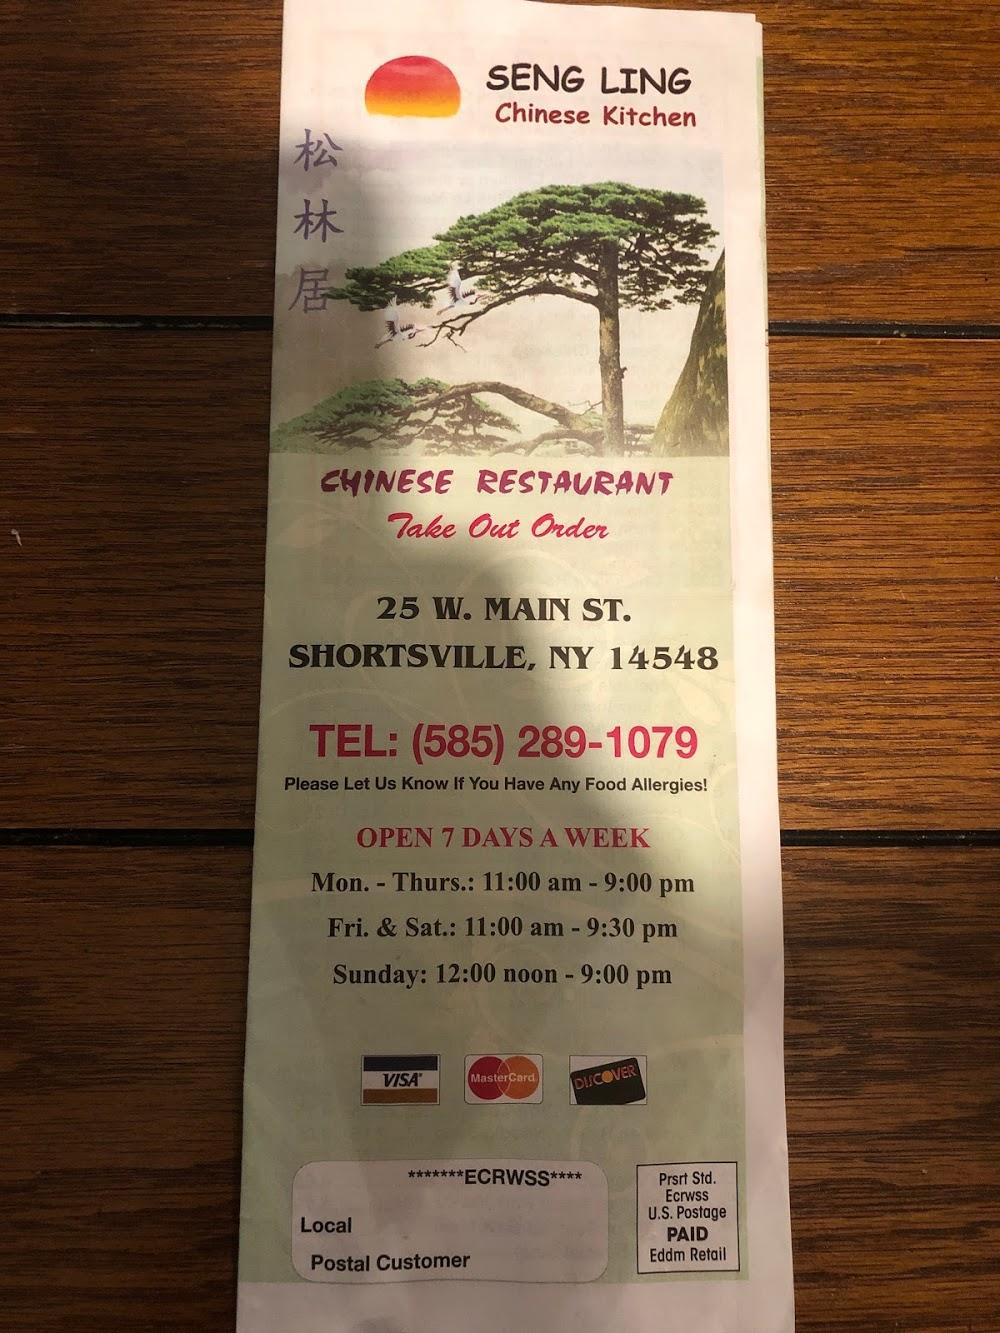 SENG LING Chinese Kitchen